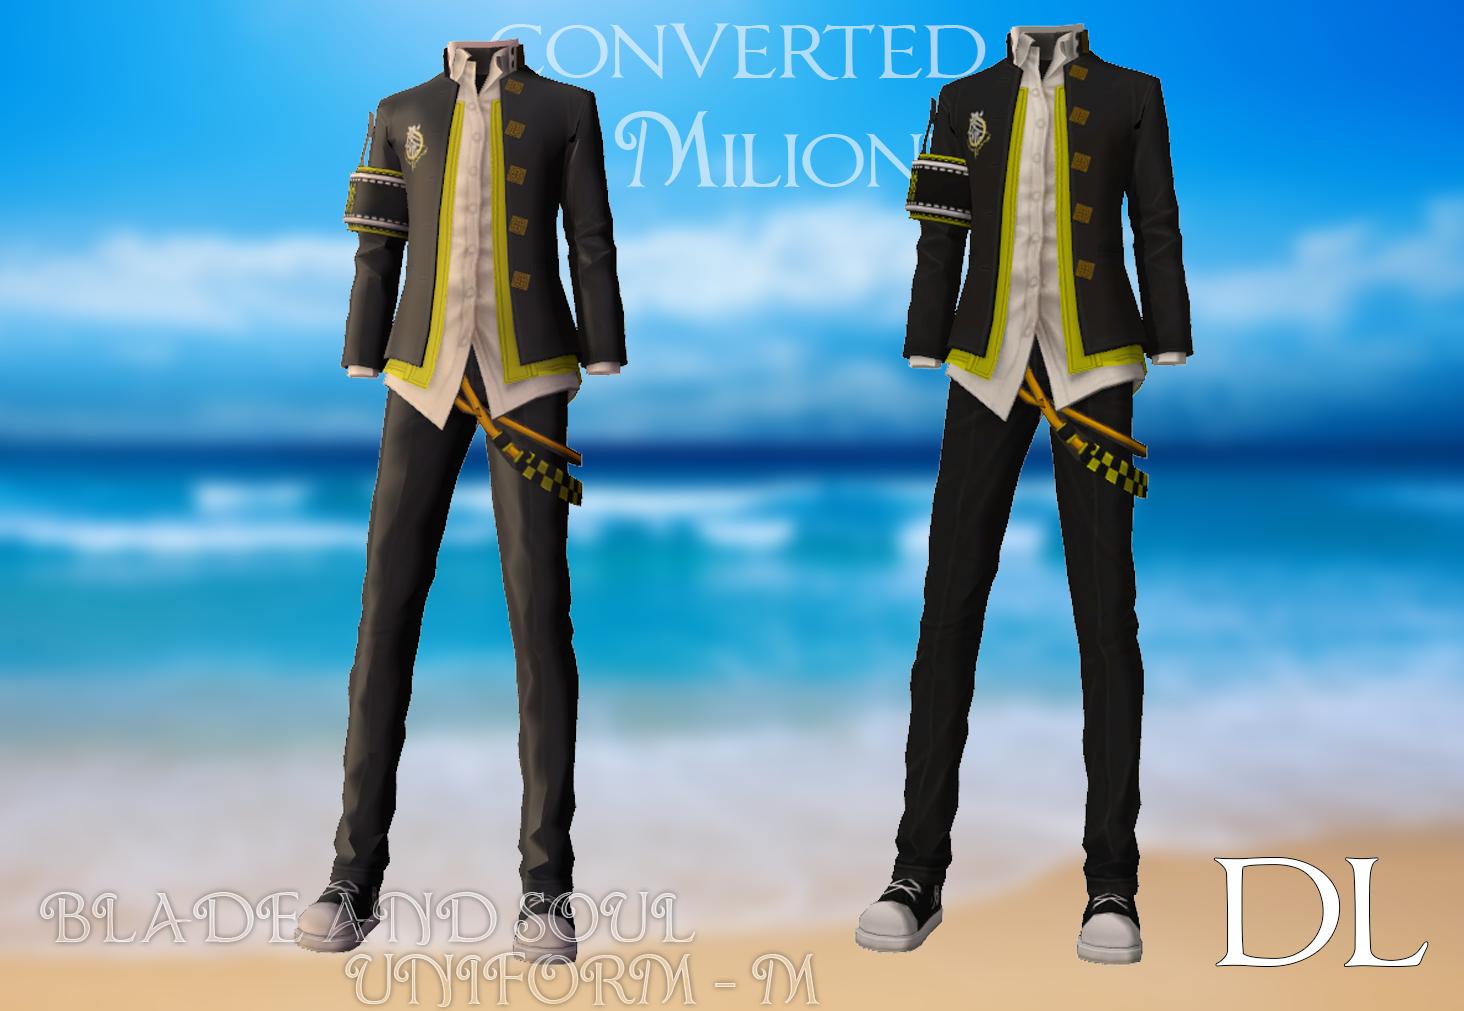 MMD BLADE AND SOUL Uniform - M [DL DOWNLOAD] by Milionna on